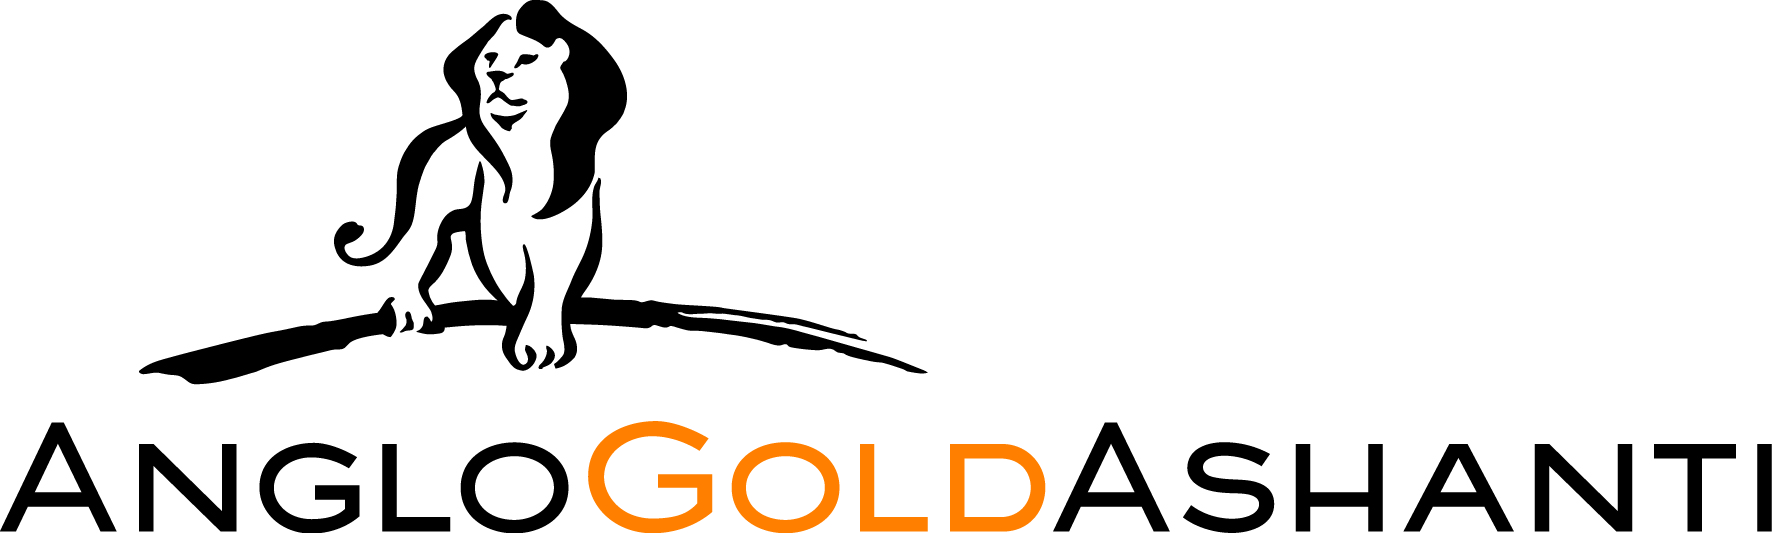 AngloGoldAshanti Logo 022414